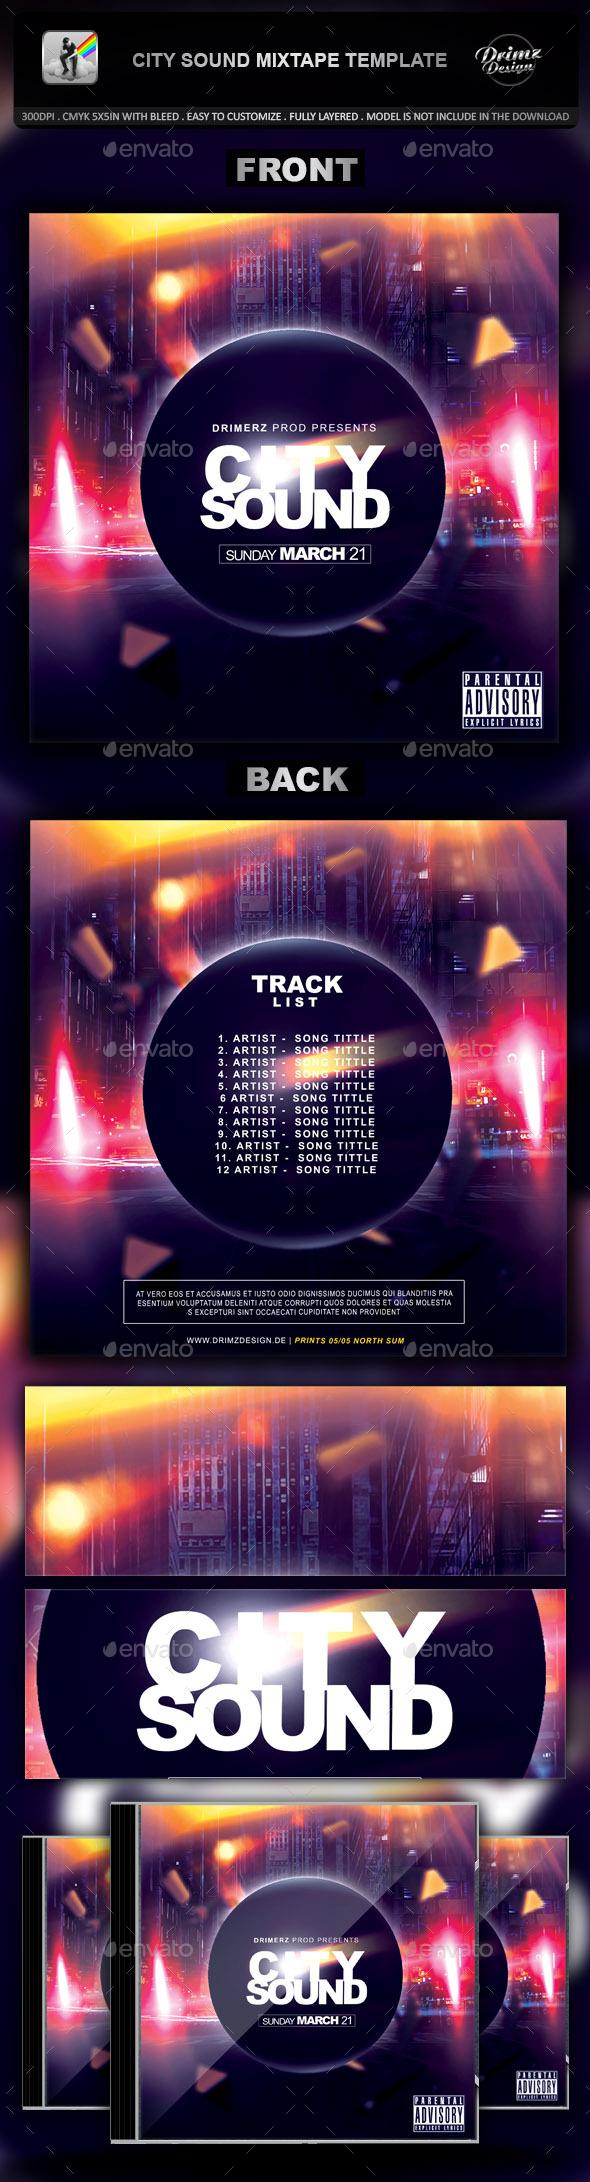 City Sound Mixtape Template - CD & DVD Artwork Print Templates